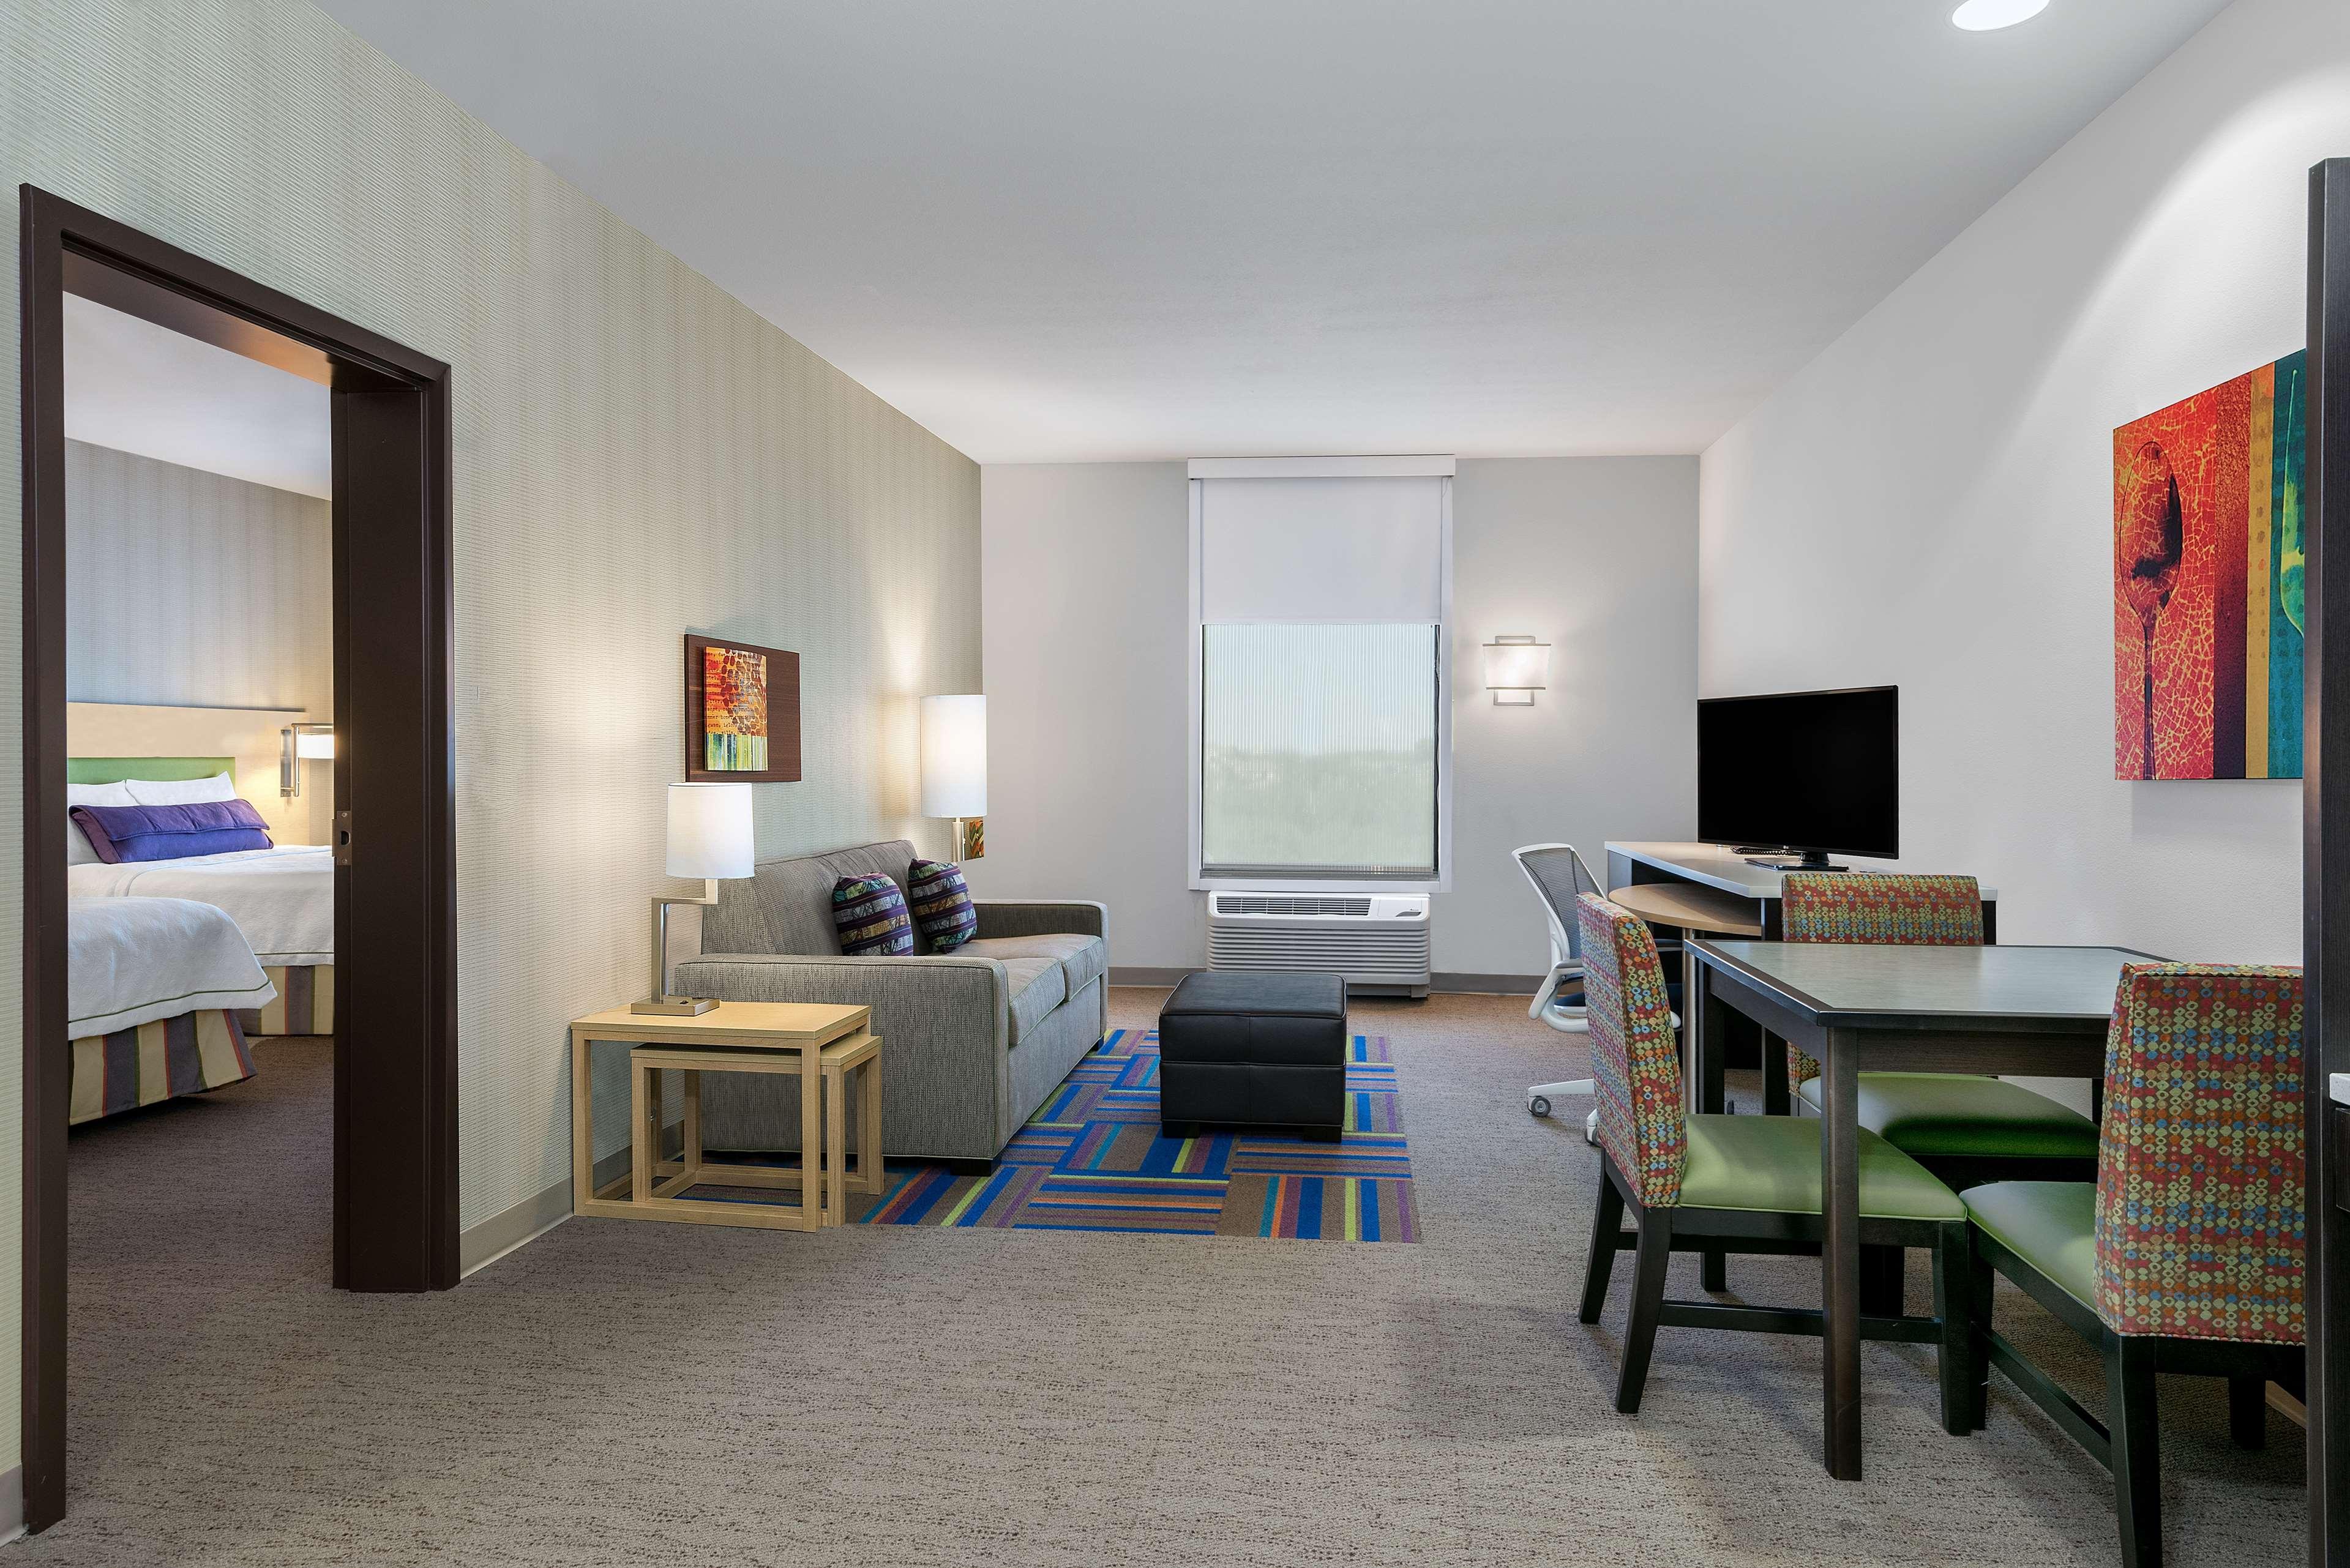 Home2 Suites by Hilton Austin Airport image 20